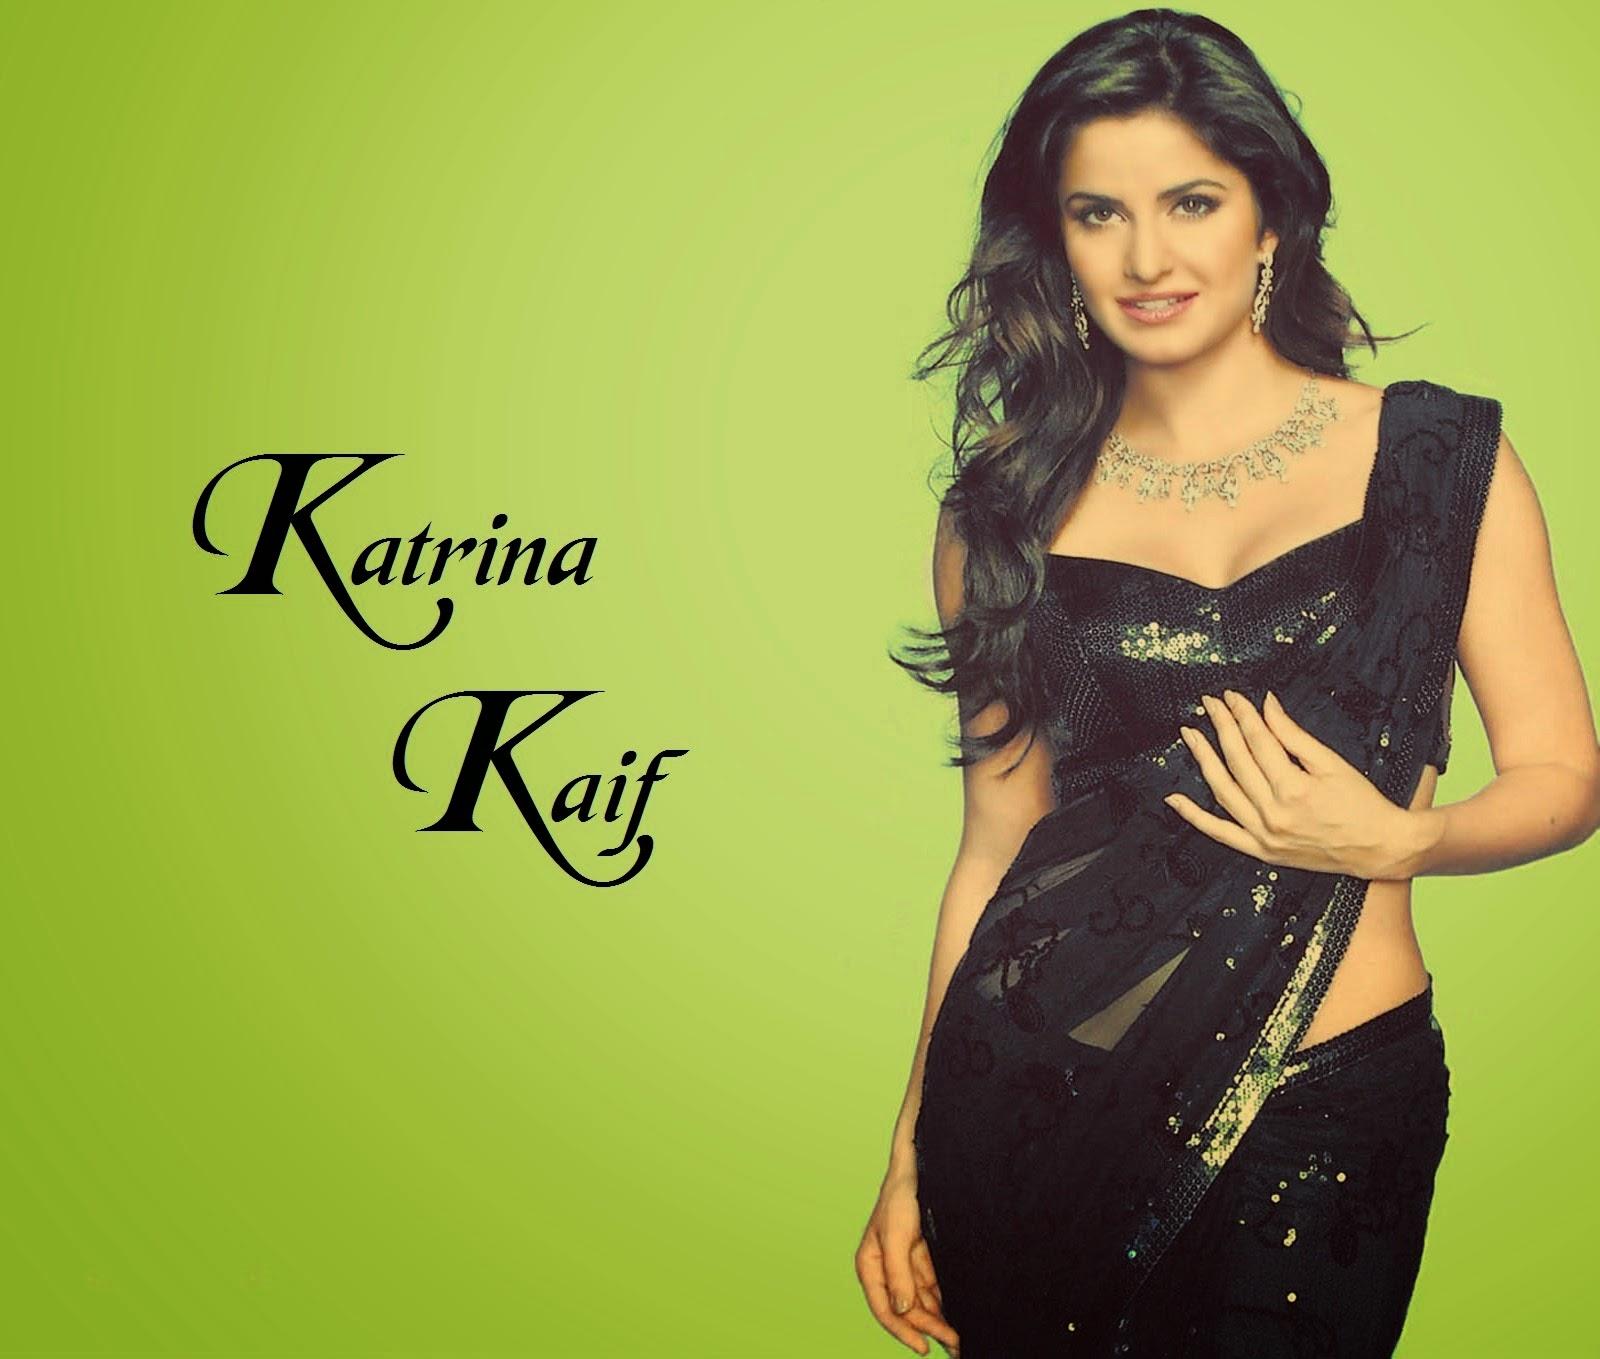 Katrina Kaif Stylish Wallpapers